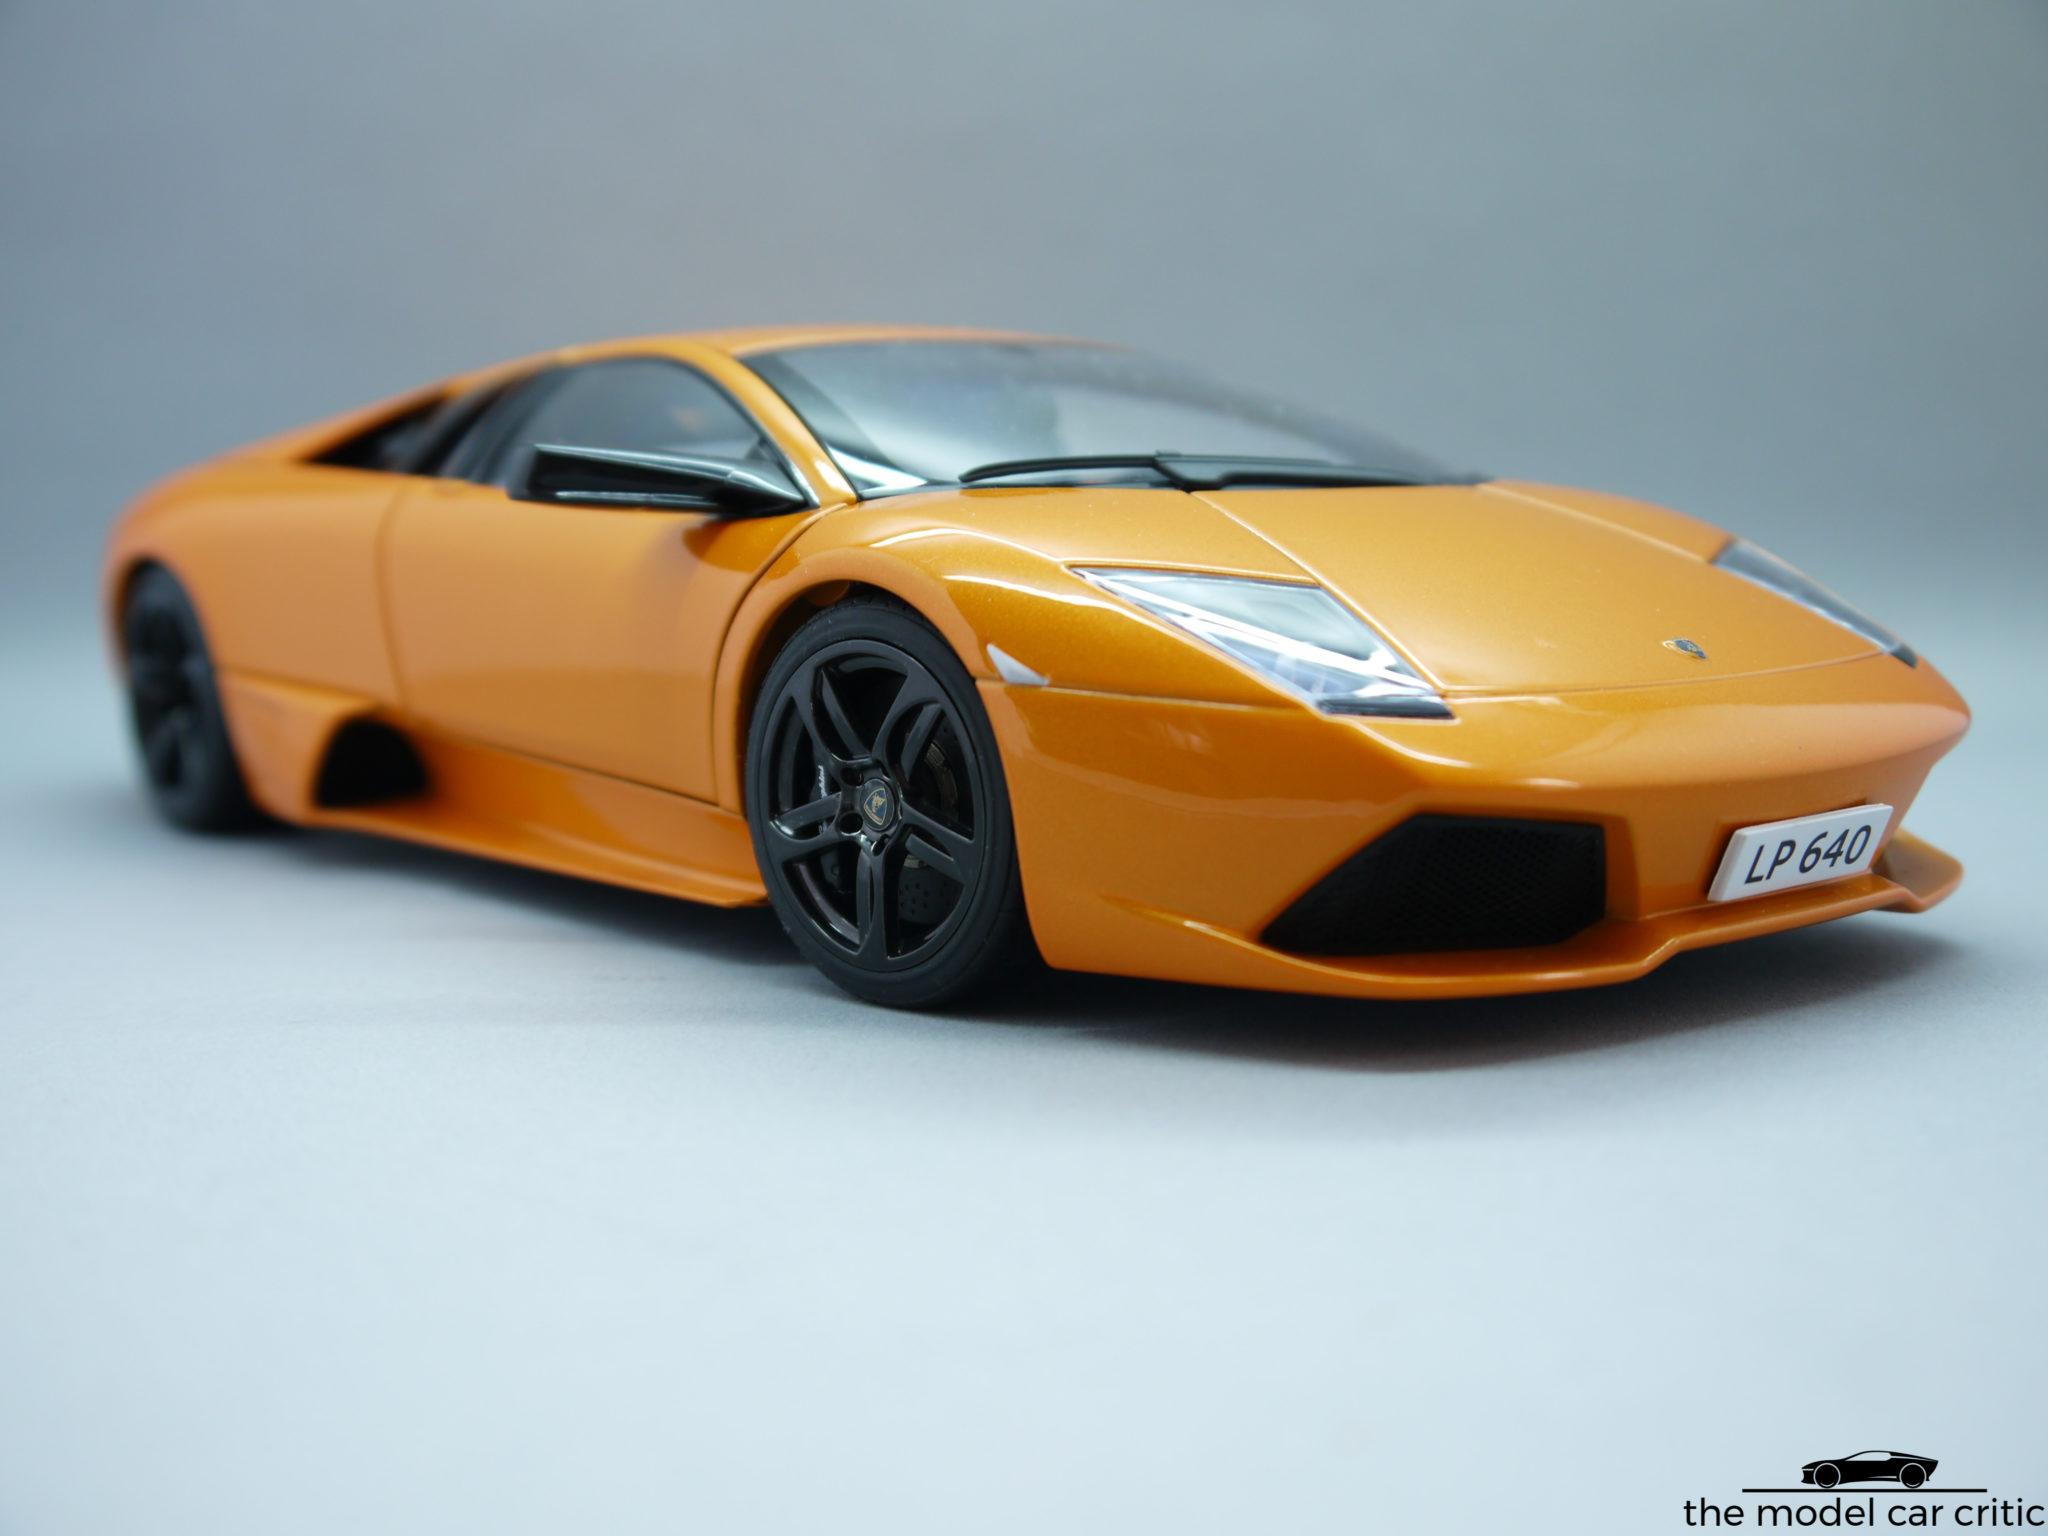 1 18 Autoart Lamborghini Murcielago Lp640 Review The Model Car Critic